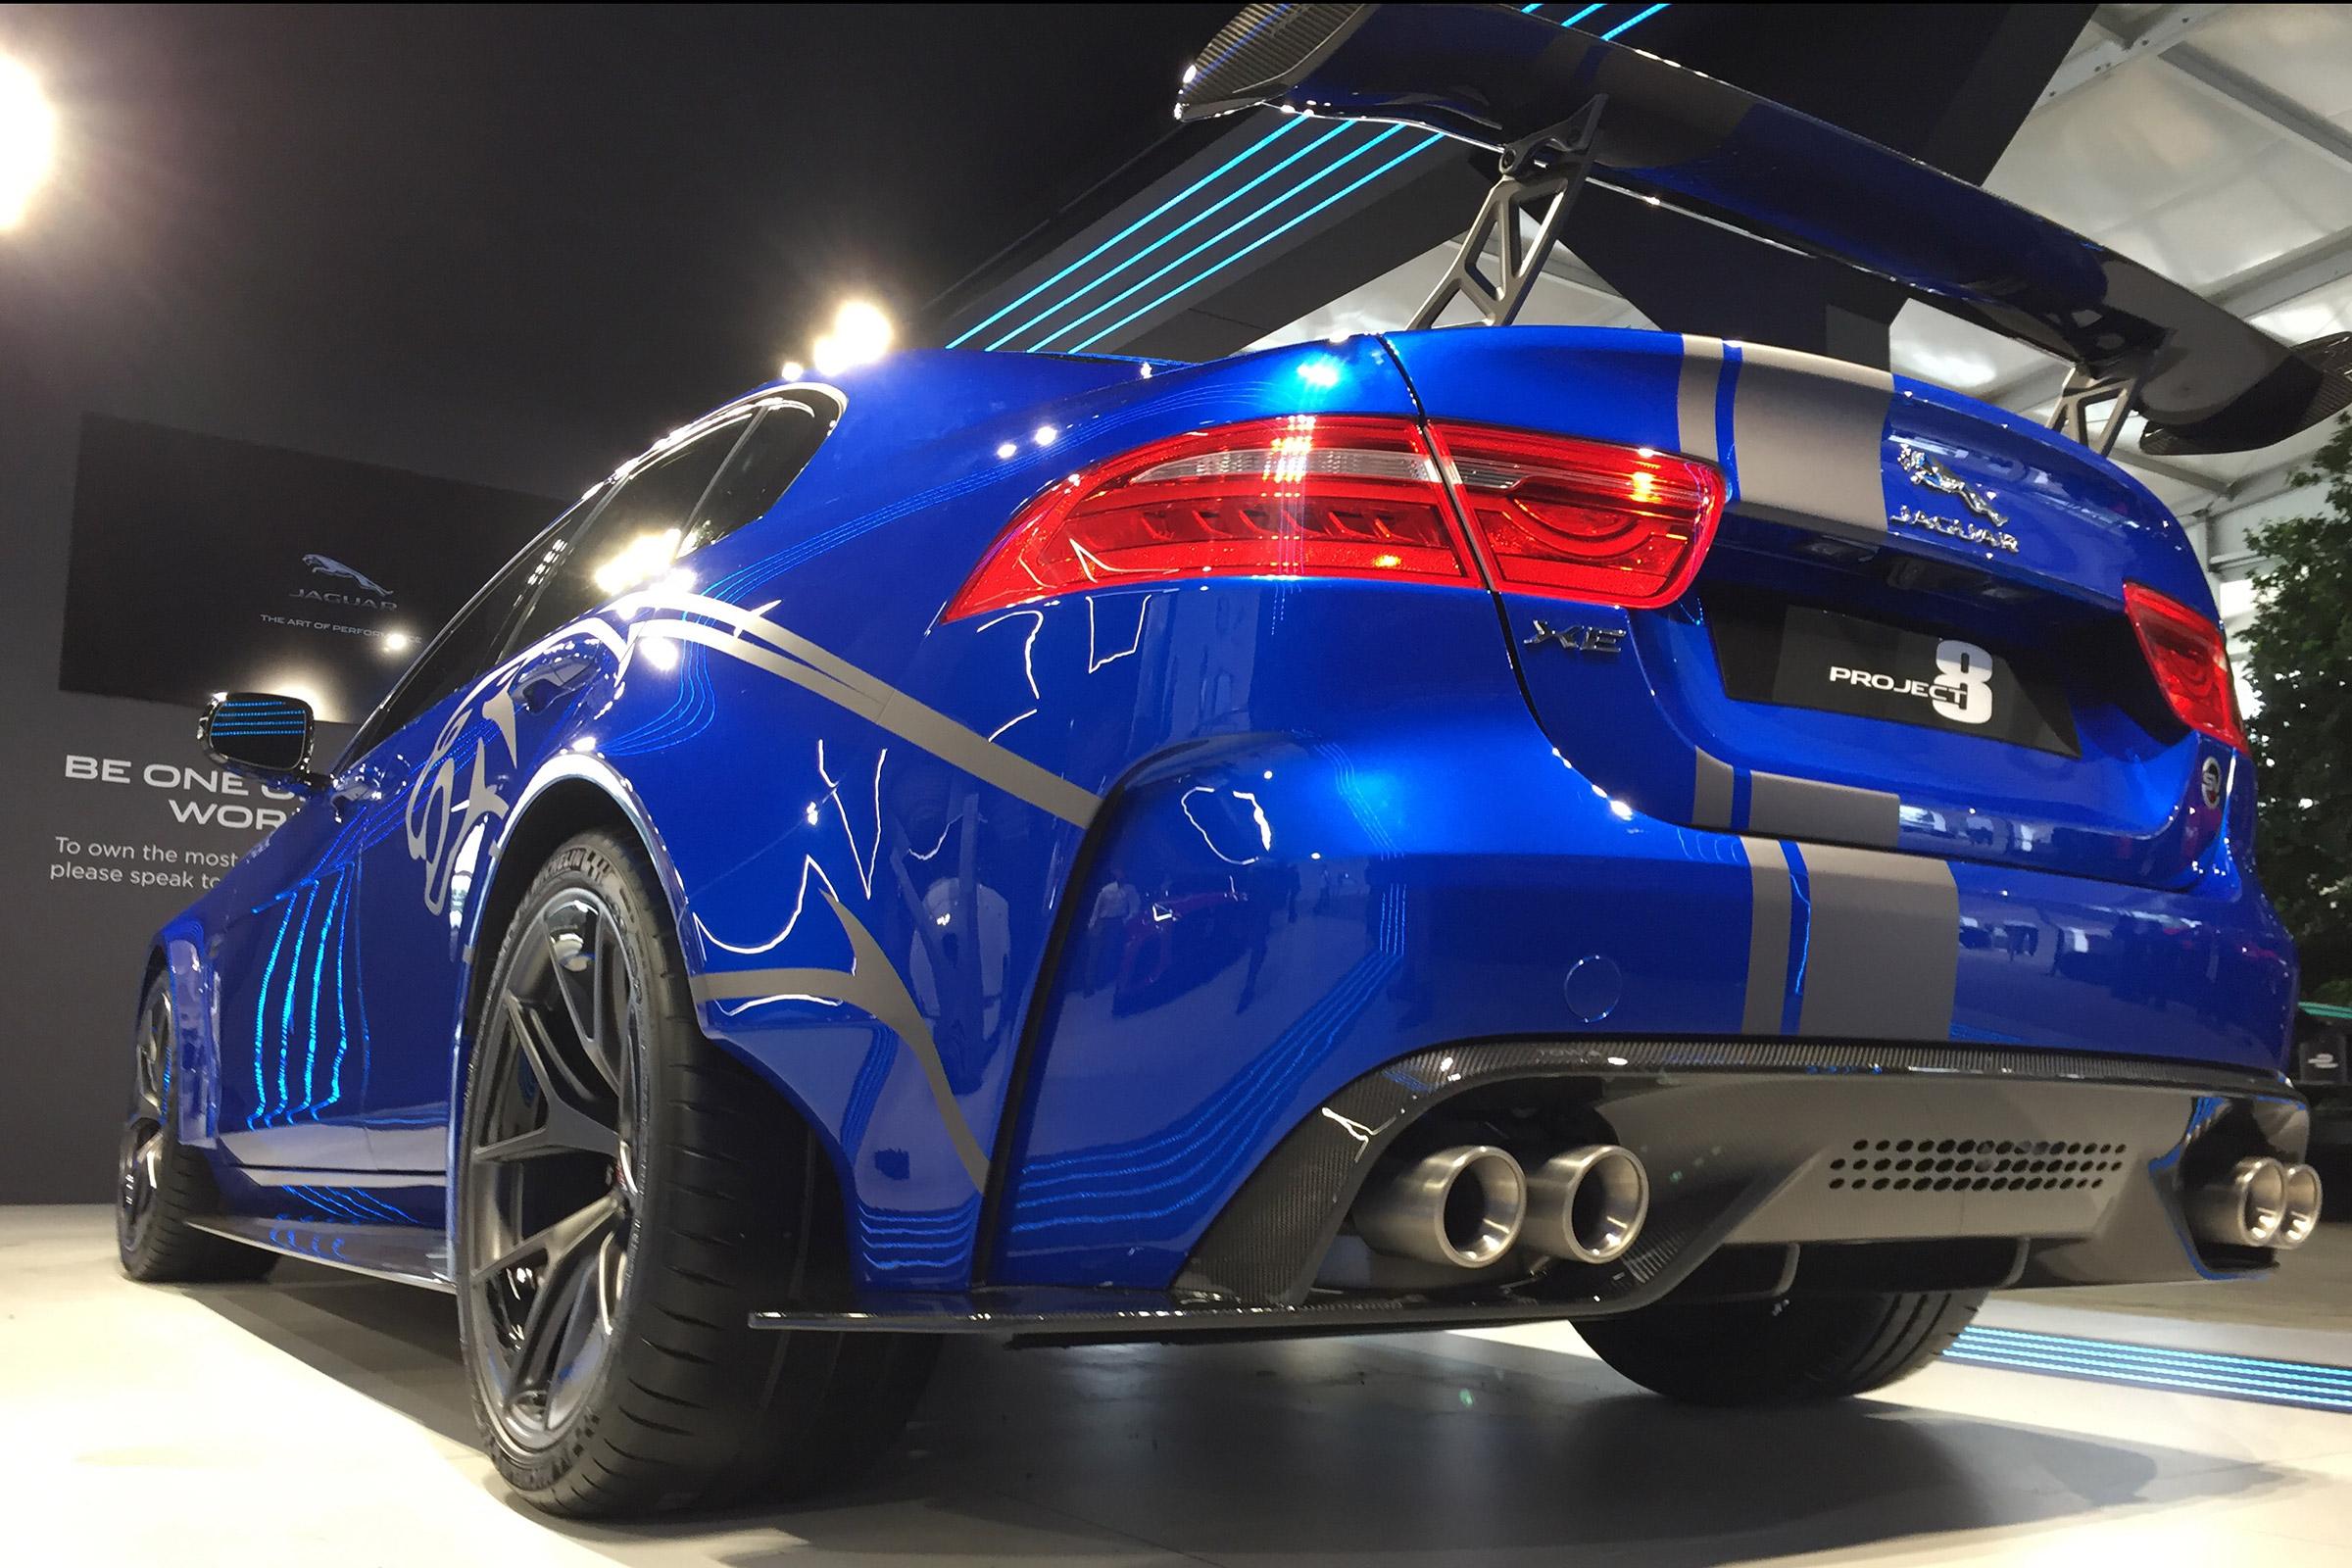 592bhp Jaguar Xe Sv Project 8 Pics Specs And 149k Price Tag Evo